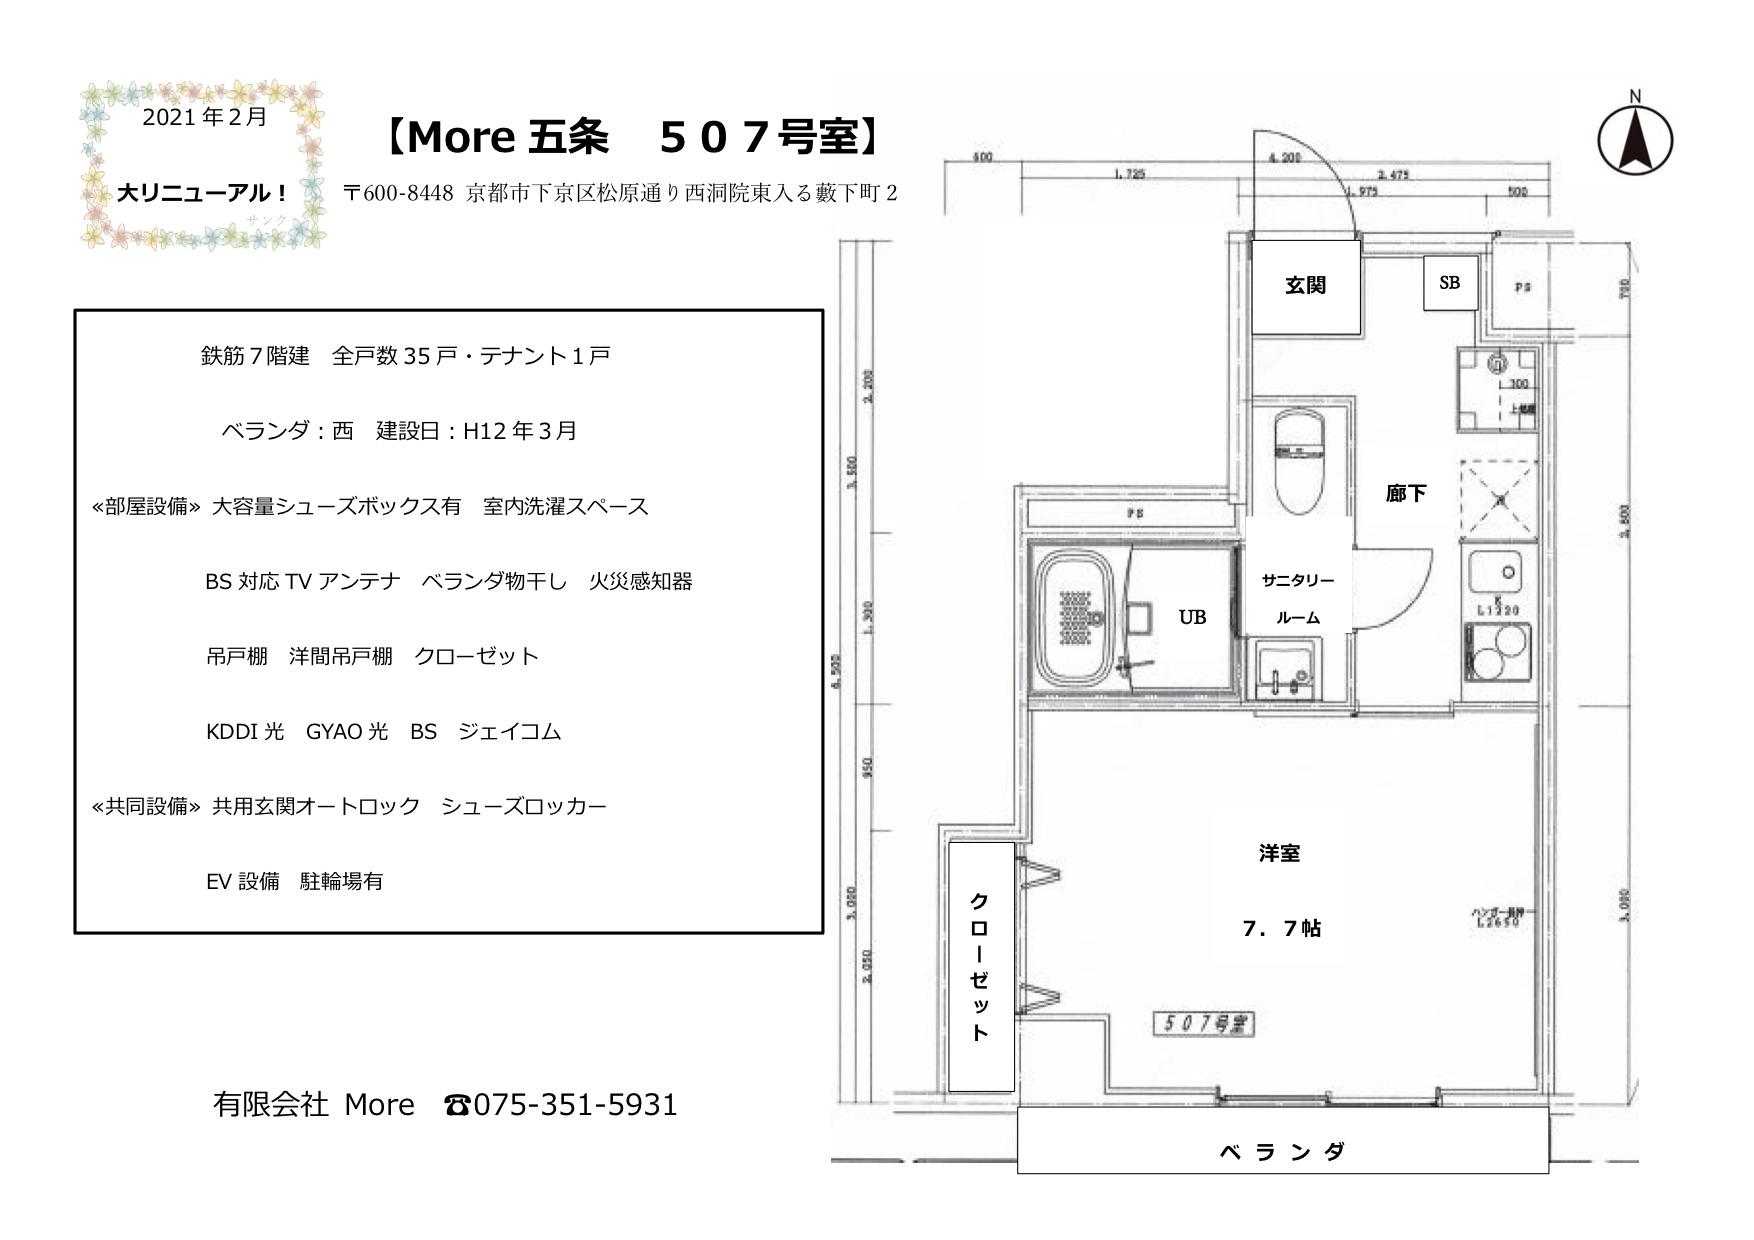 More五条 507号室